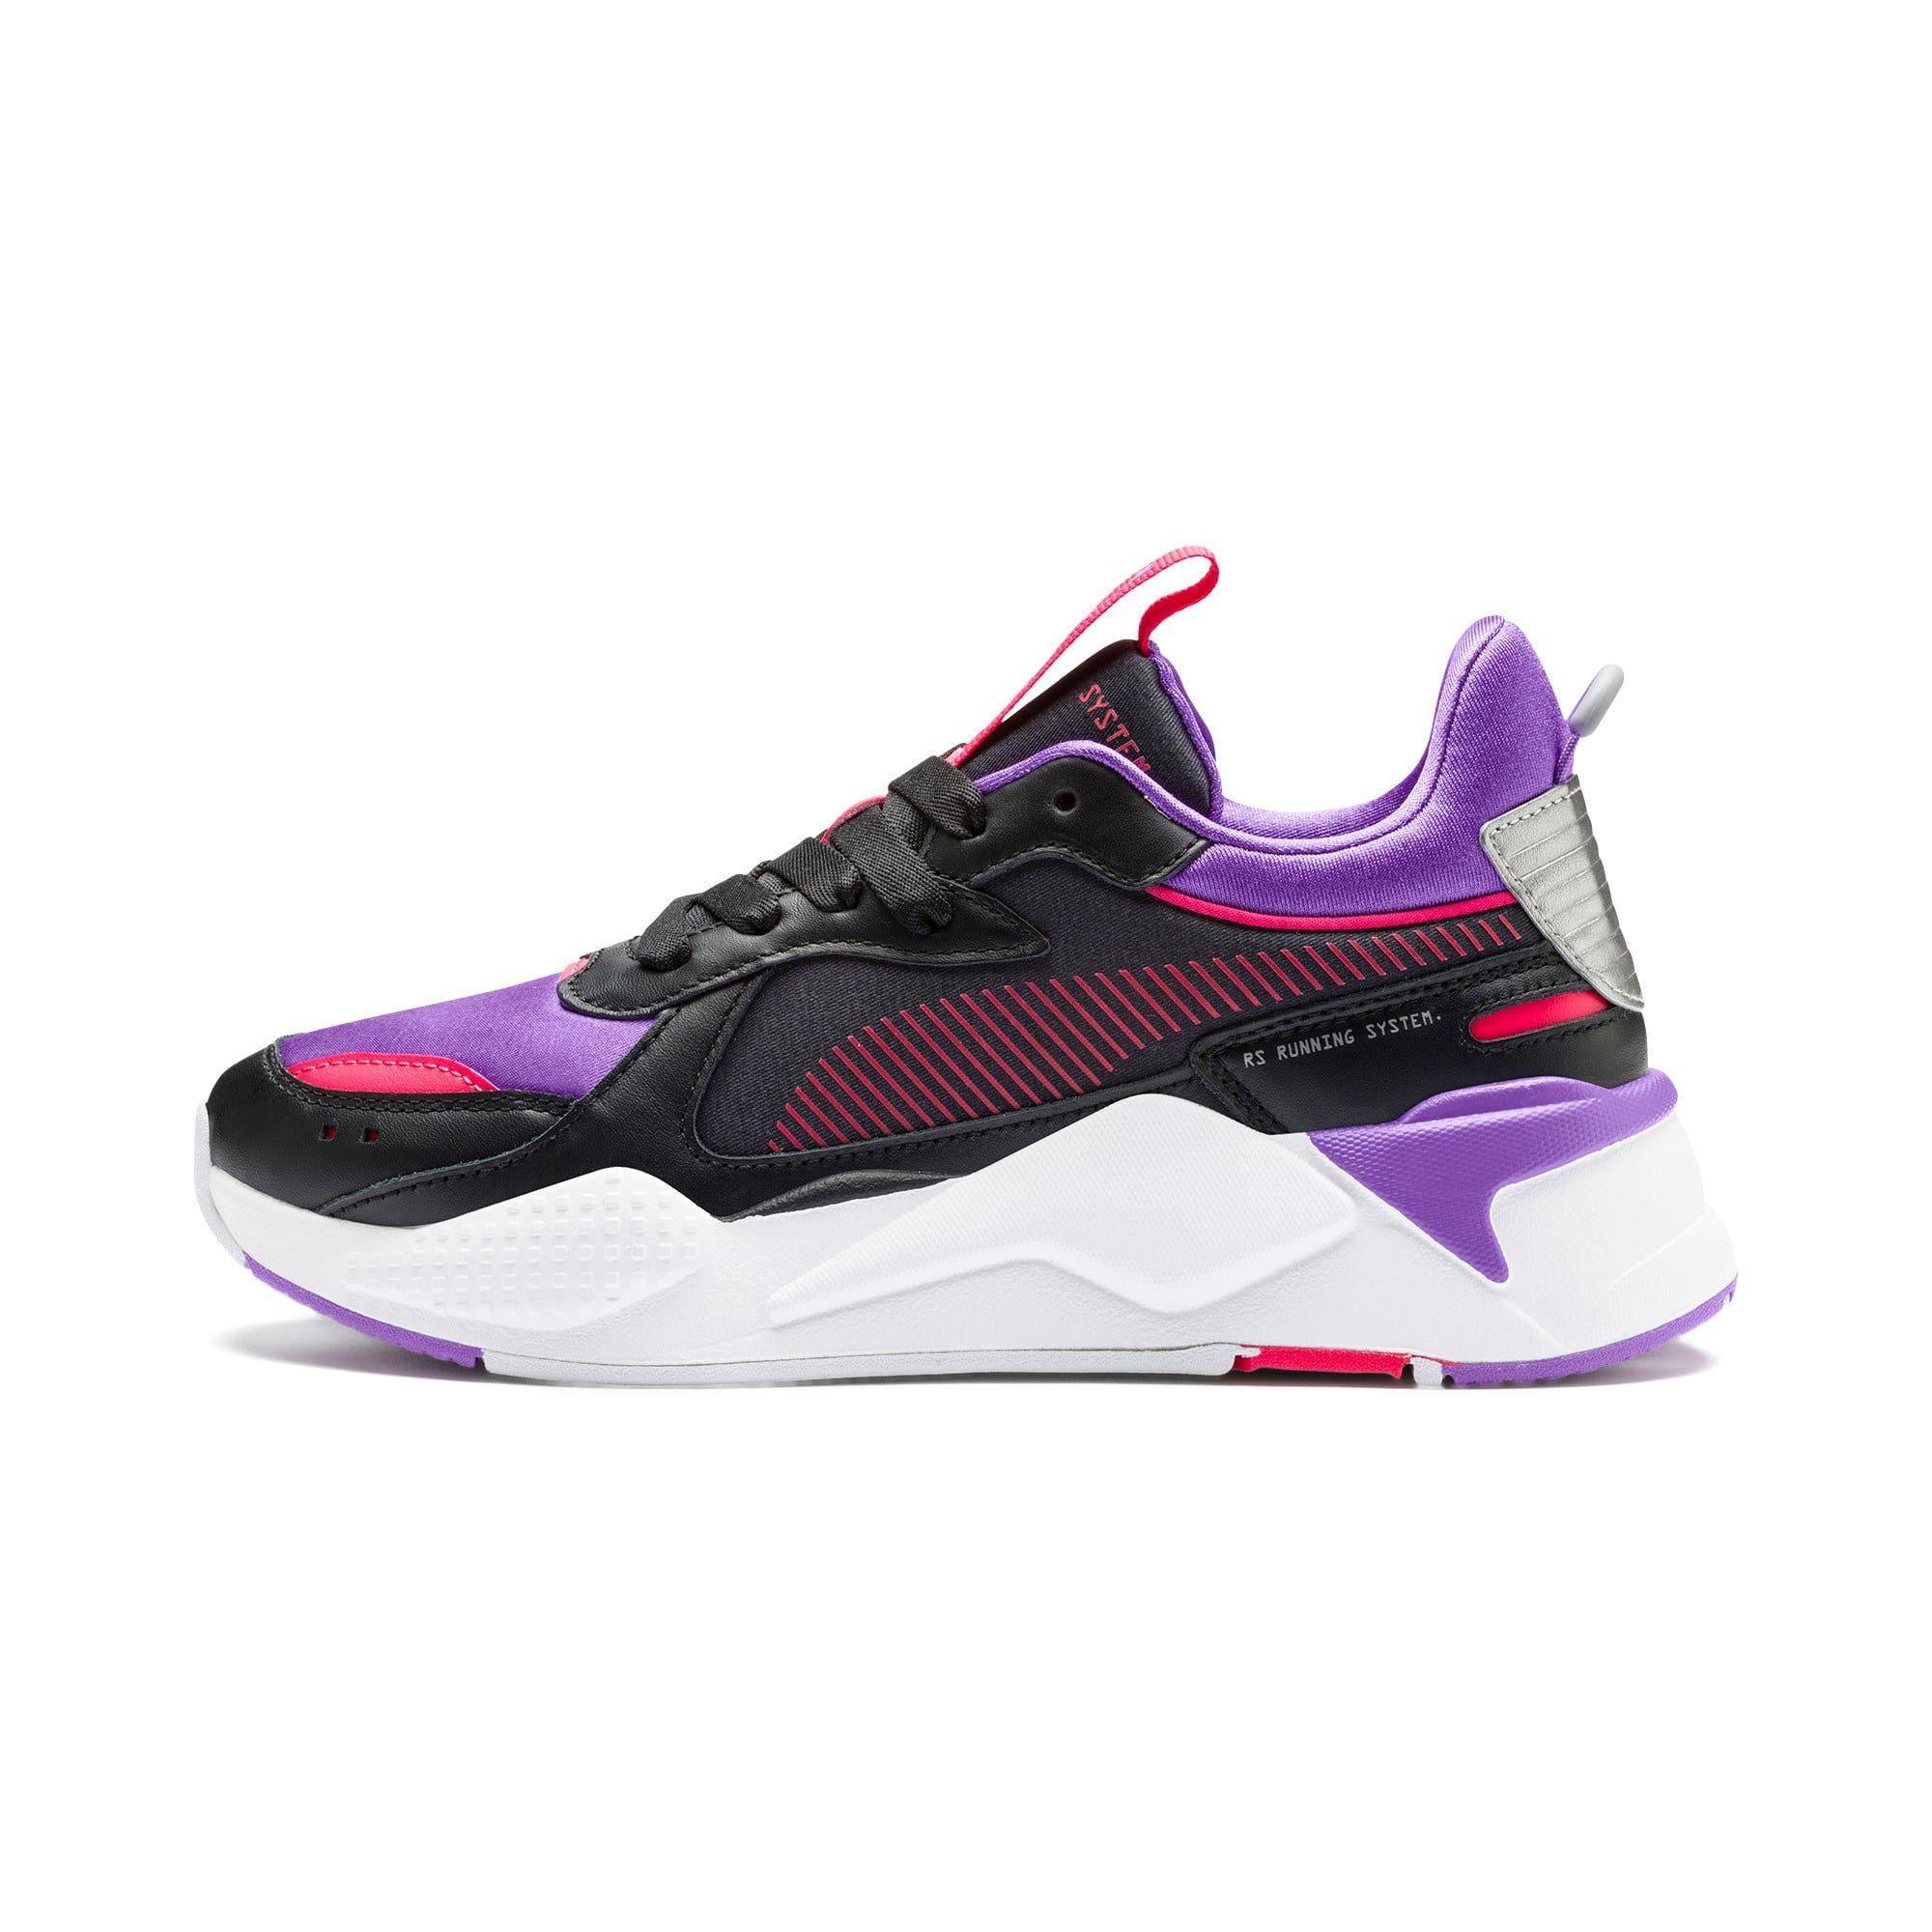 PUMA Rs-X Metallic Women's Trainers in Black/Purple Glimmer size ...